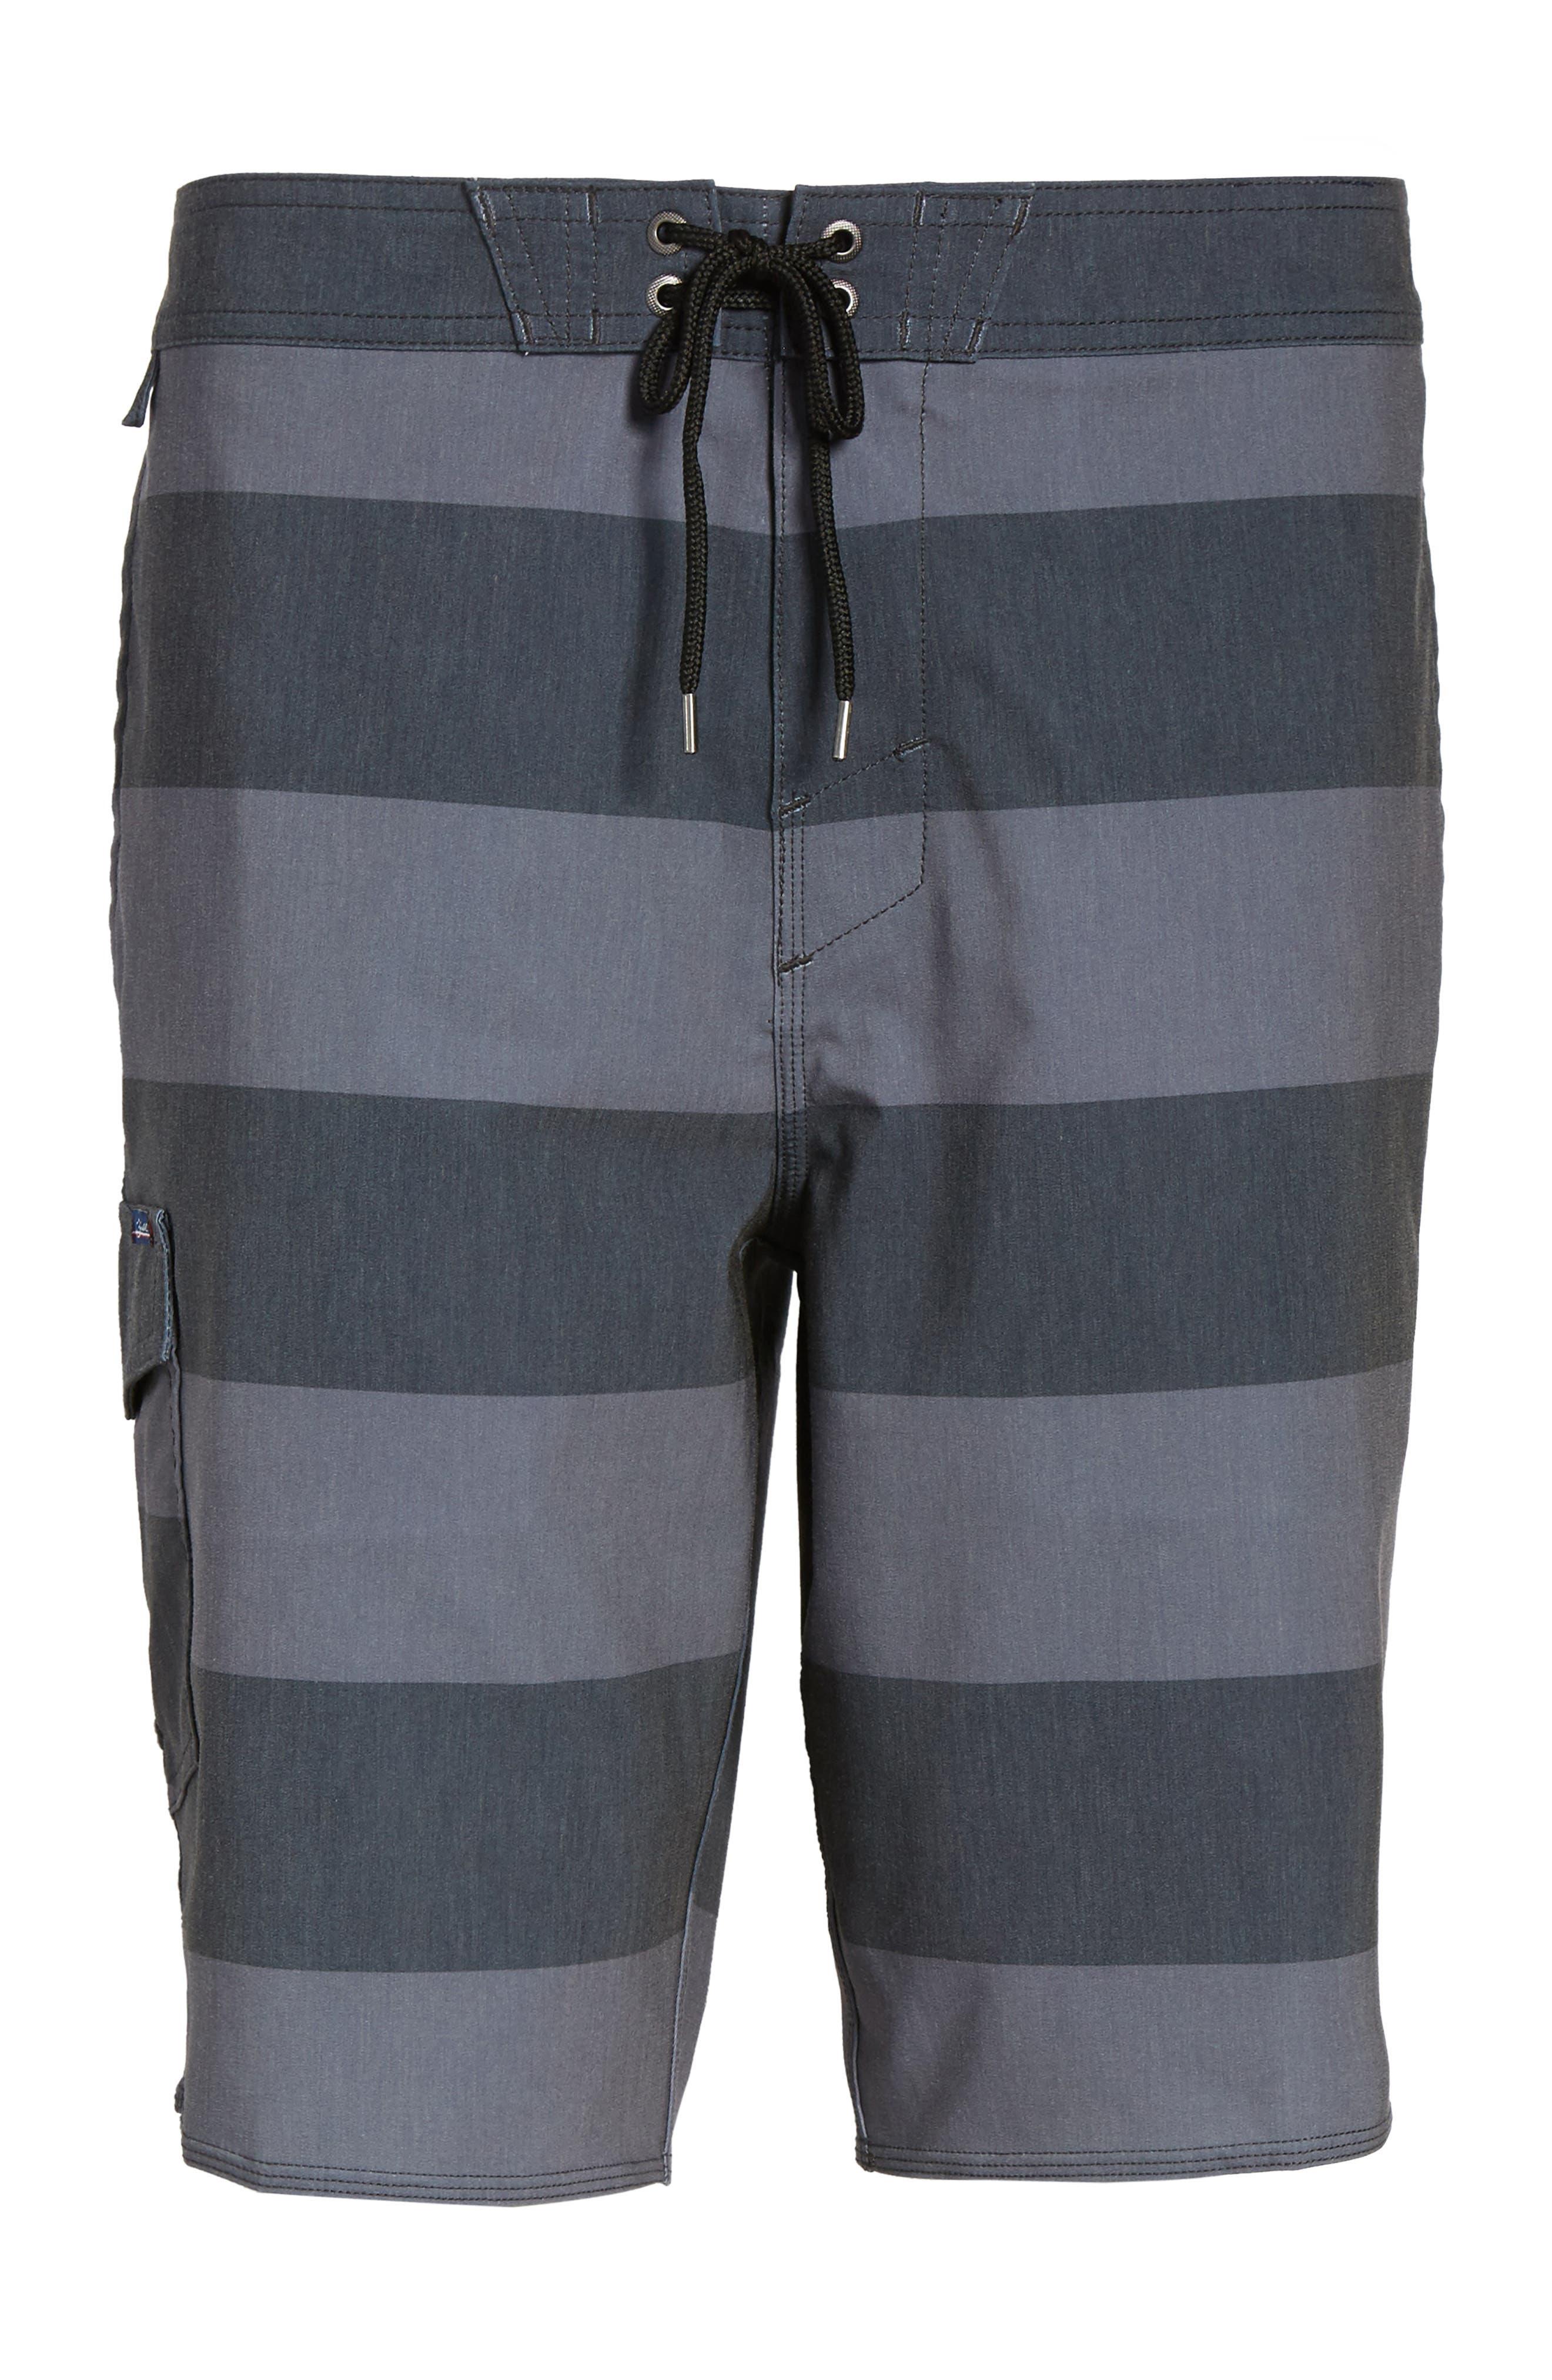 Homage Board Shorts,                             Alternate thumbnail 6, color,                             Black